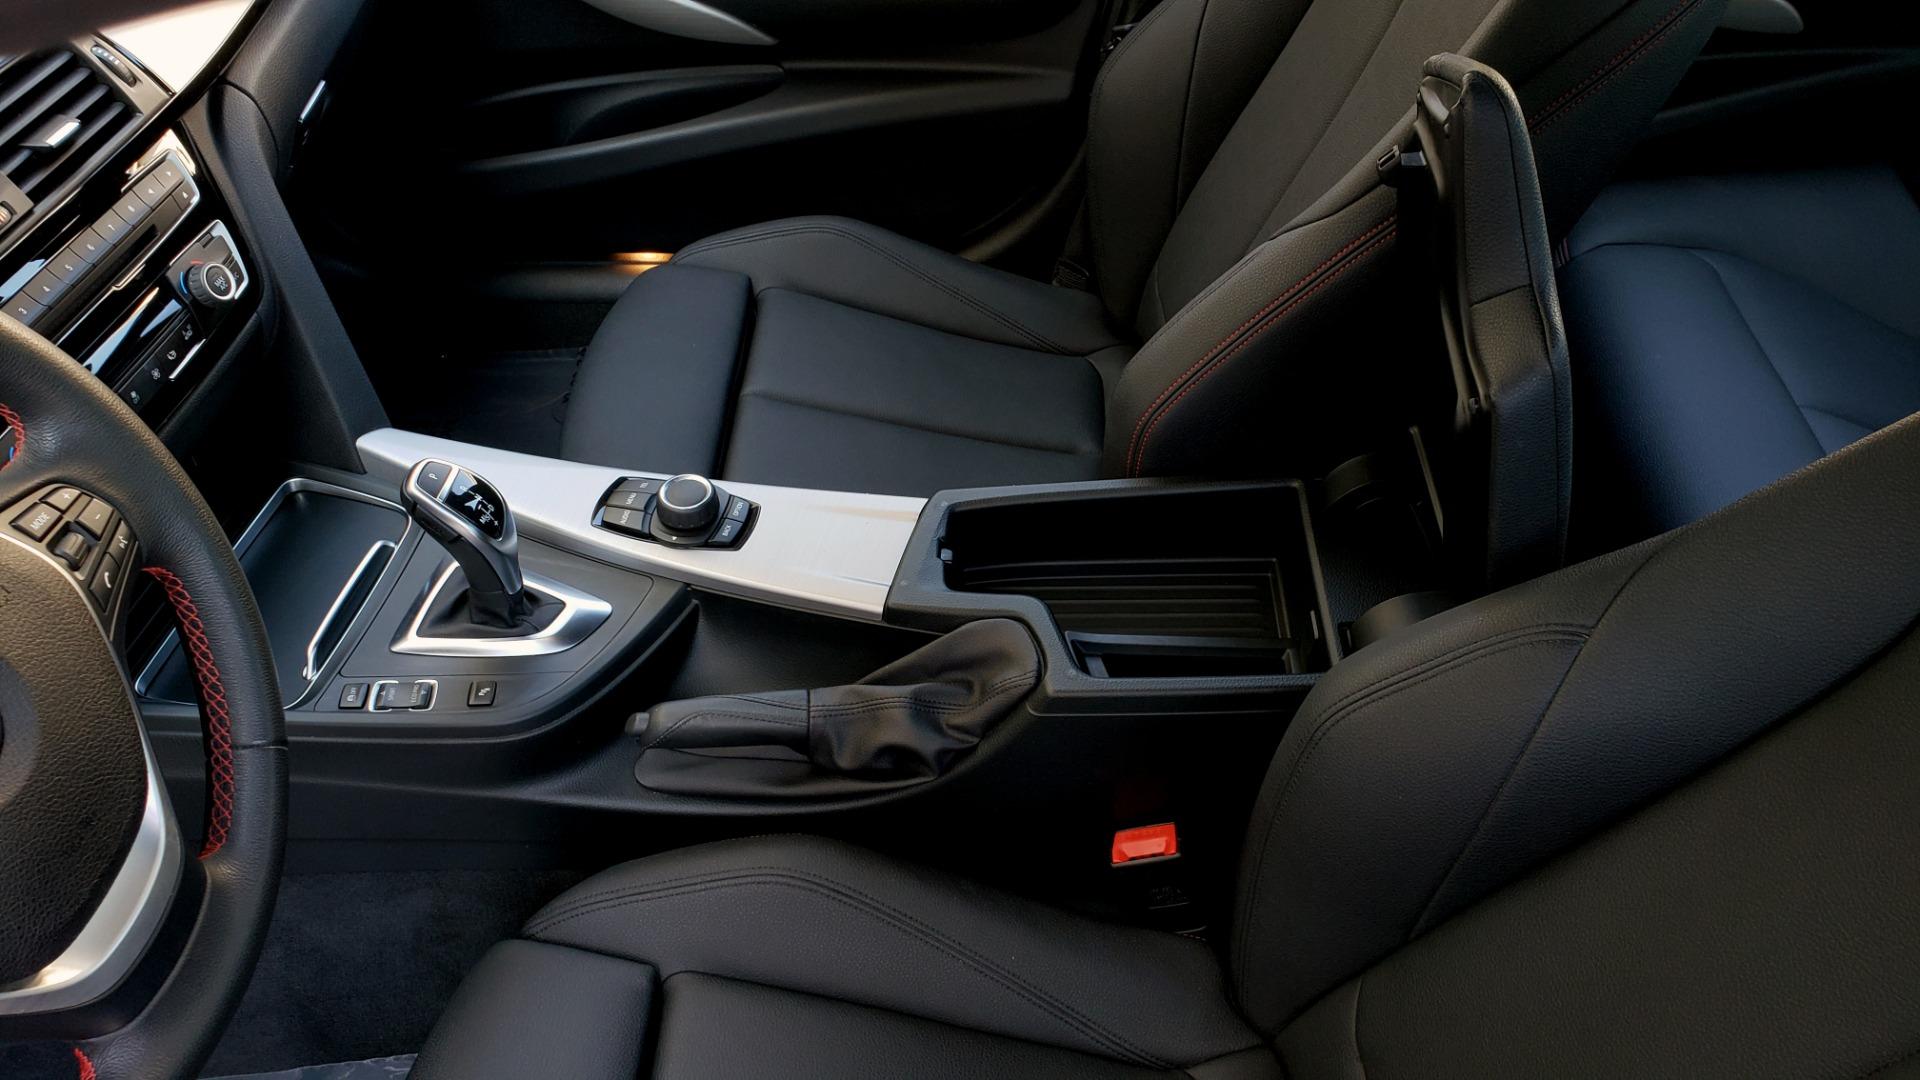 Used 2017 BMW 3 SERIES 330I SPORT SEDAN / DRVR ASST PKG / SUNROOF / REARVIEW for sale Sold at Formula Imports in Charlotte NC 28227 55